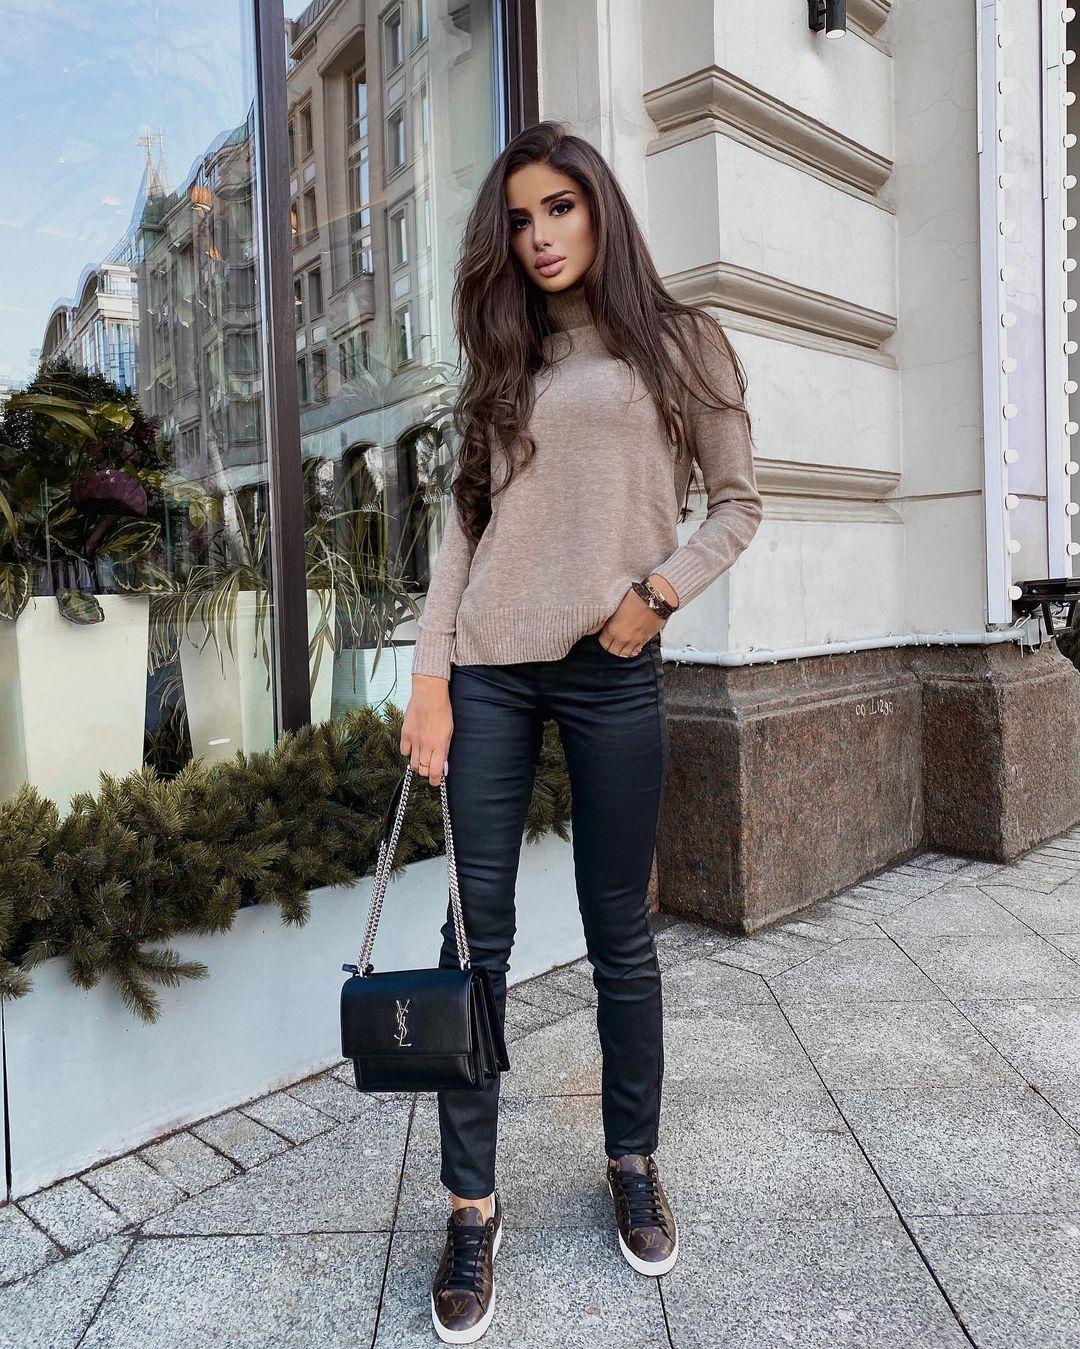 Sabina-Agaeva-Wallpapers-Insta-Fit-Bio-14